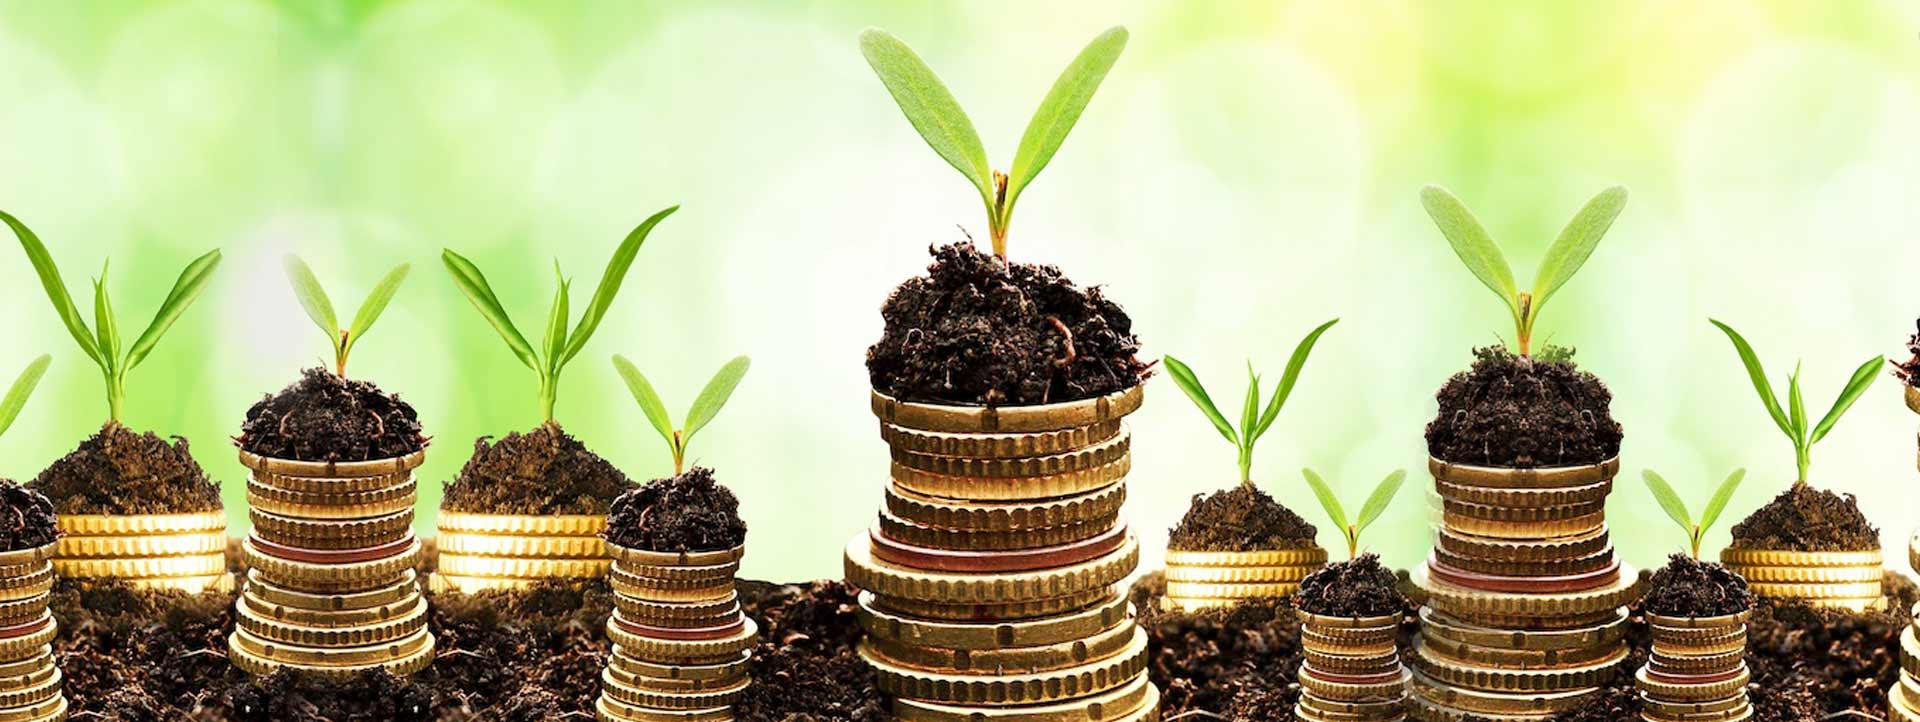 Netherlands to issue green bonds worth up to €6 billion